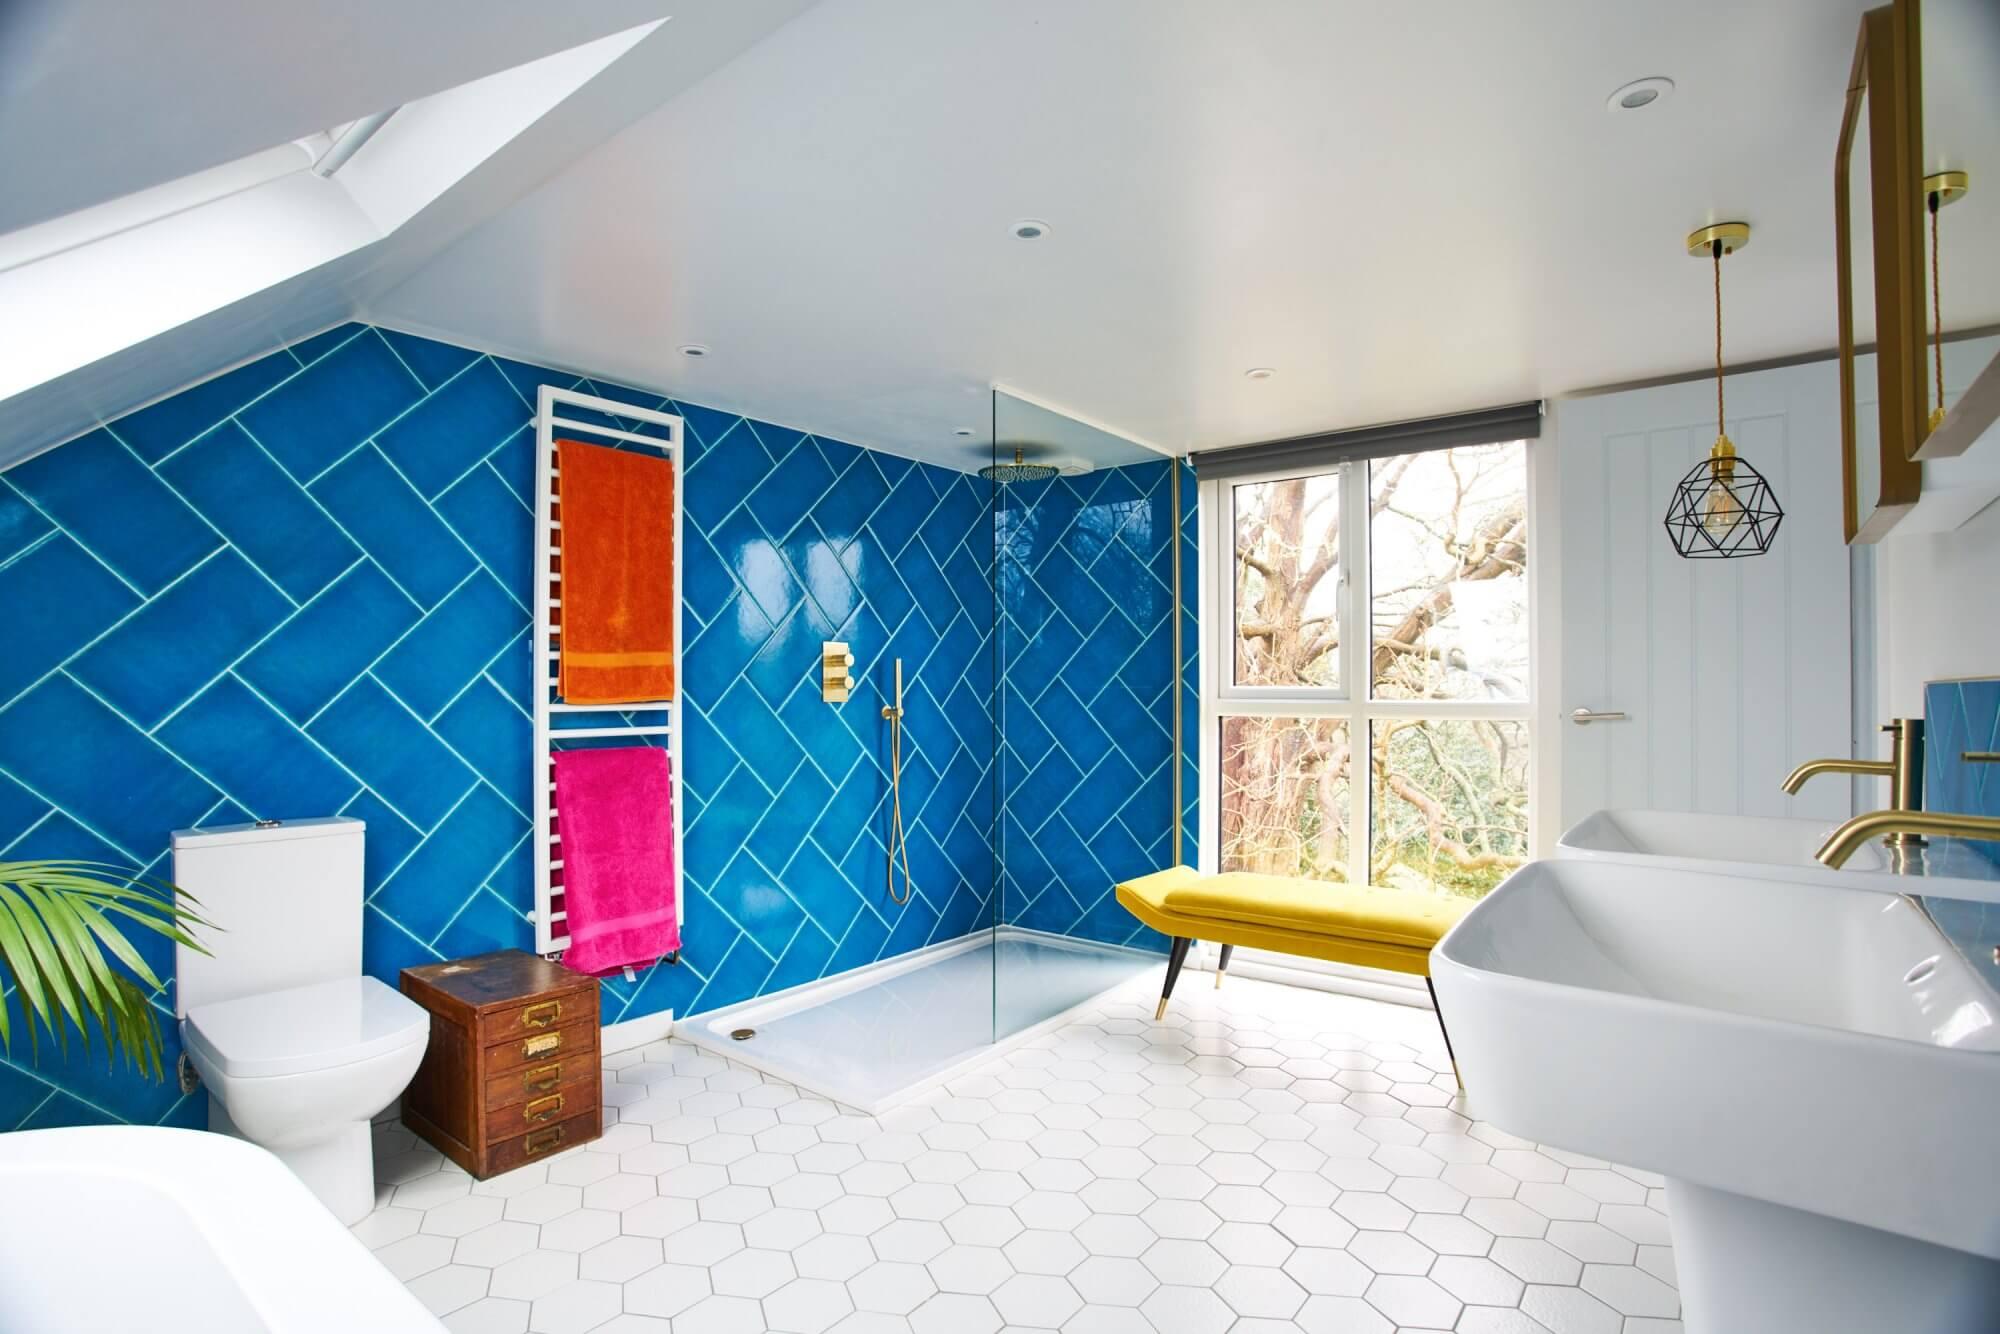 Luxury Bathroom Design | The Brighton Bathroom Company